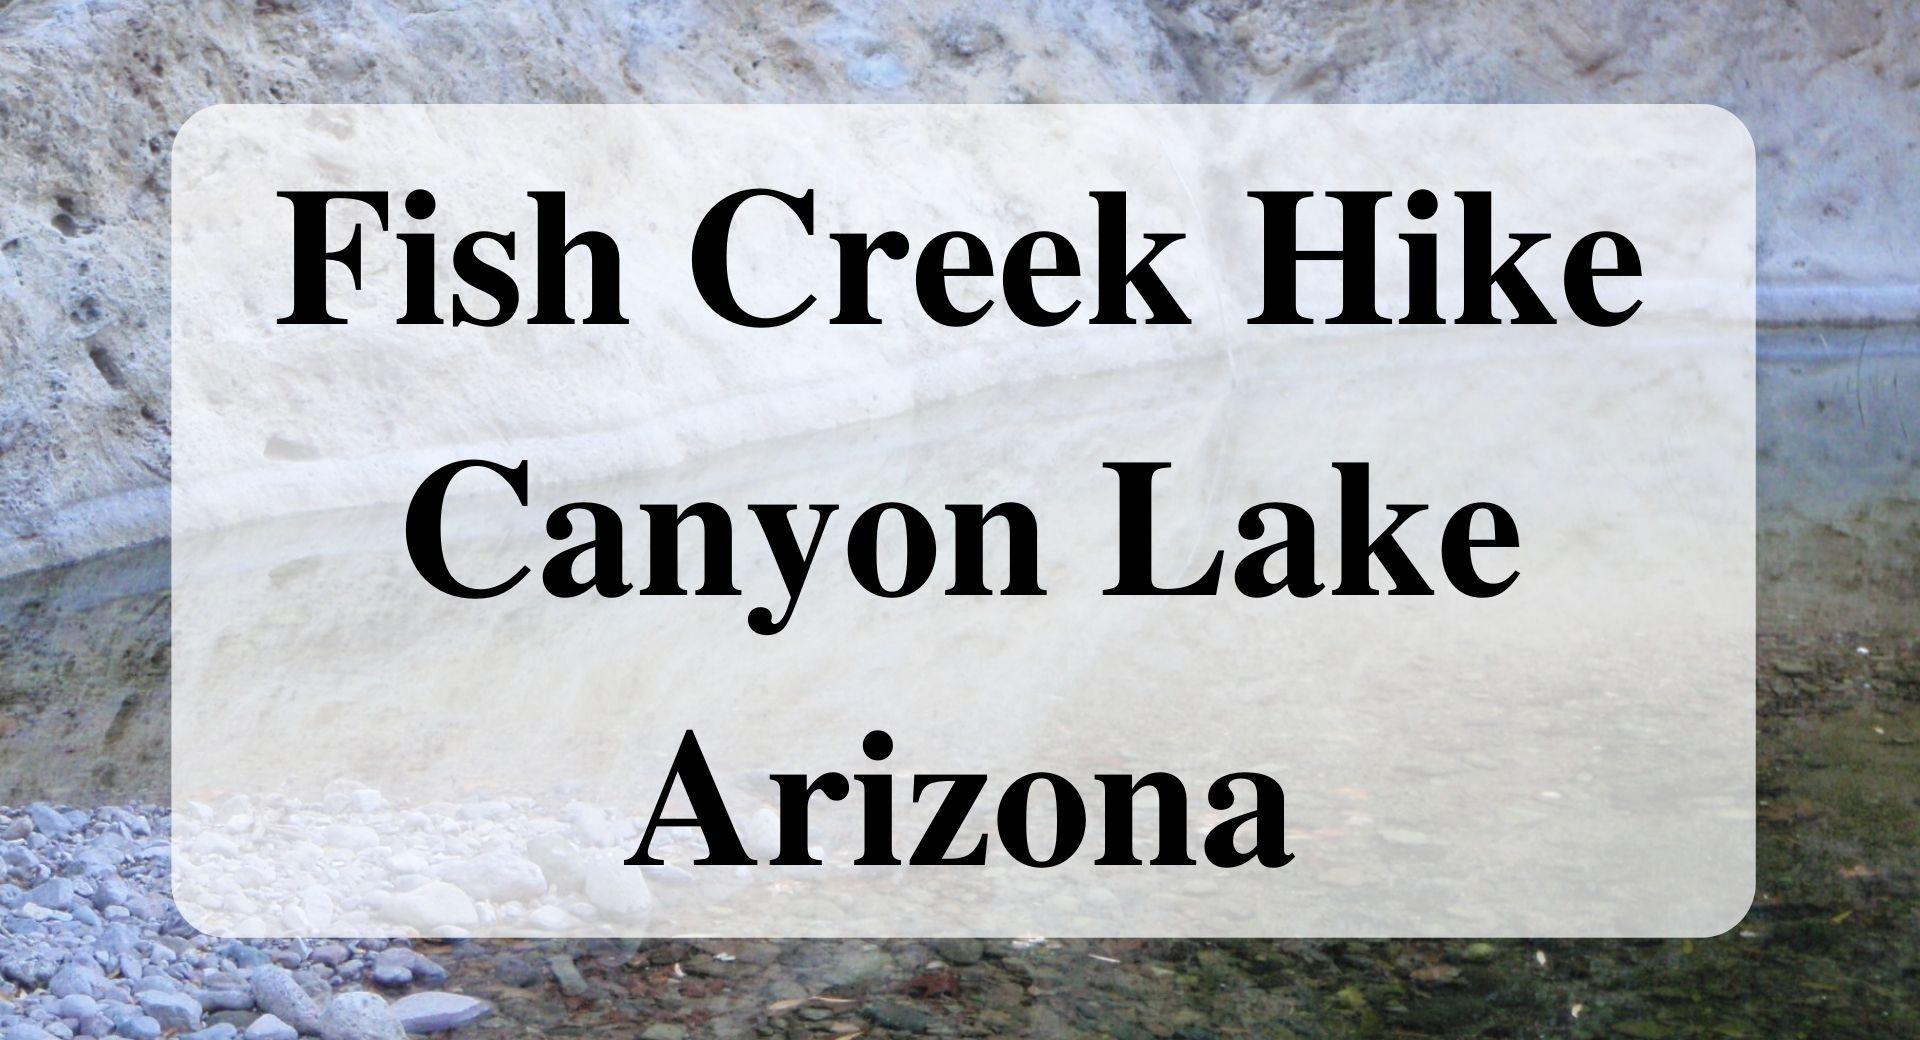 Fish Creek Hike Canyon Lake Arizona main Forever sabbatical